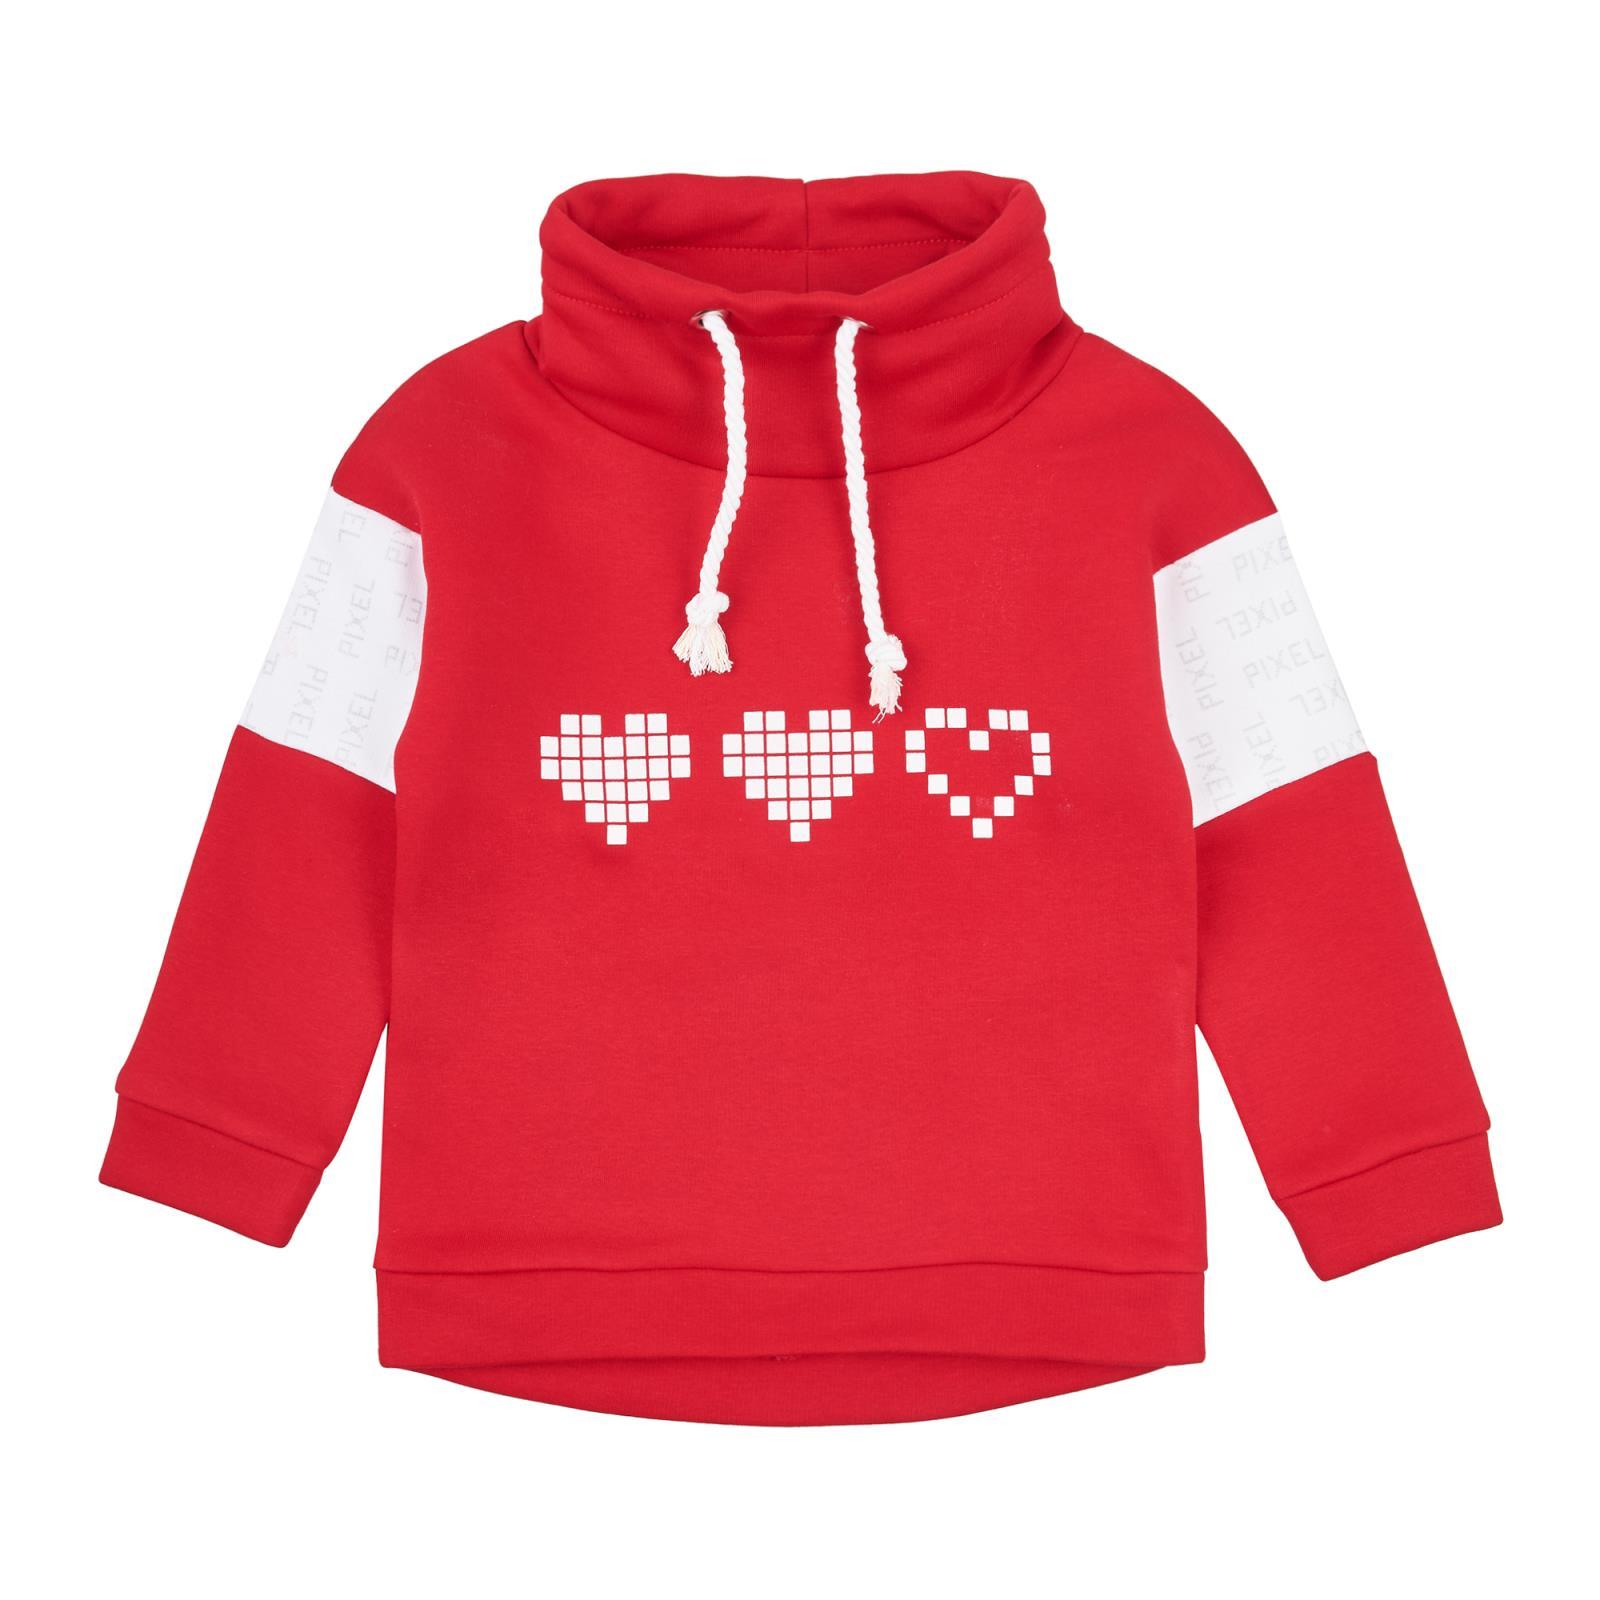 Реглан детские O! Kids Clothing модель OKC~96272-1 , 2017